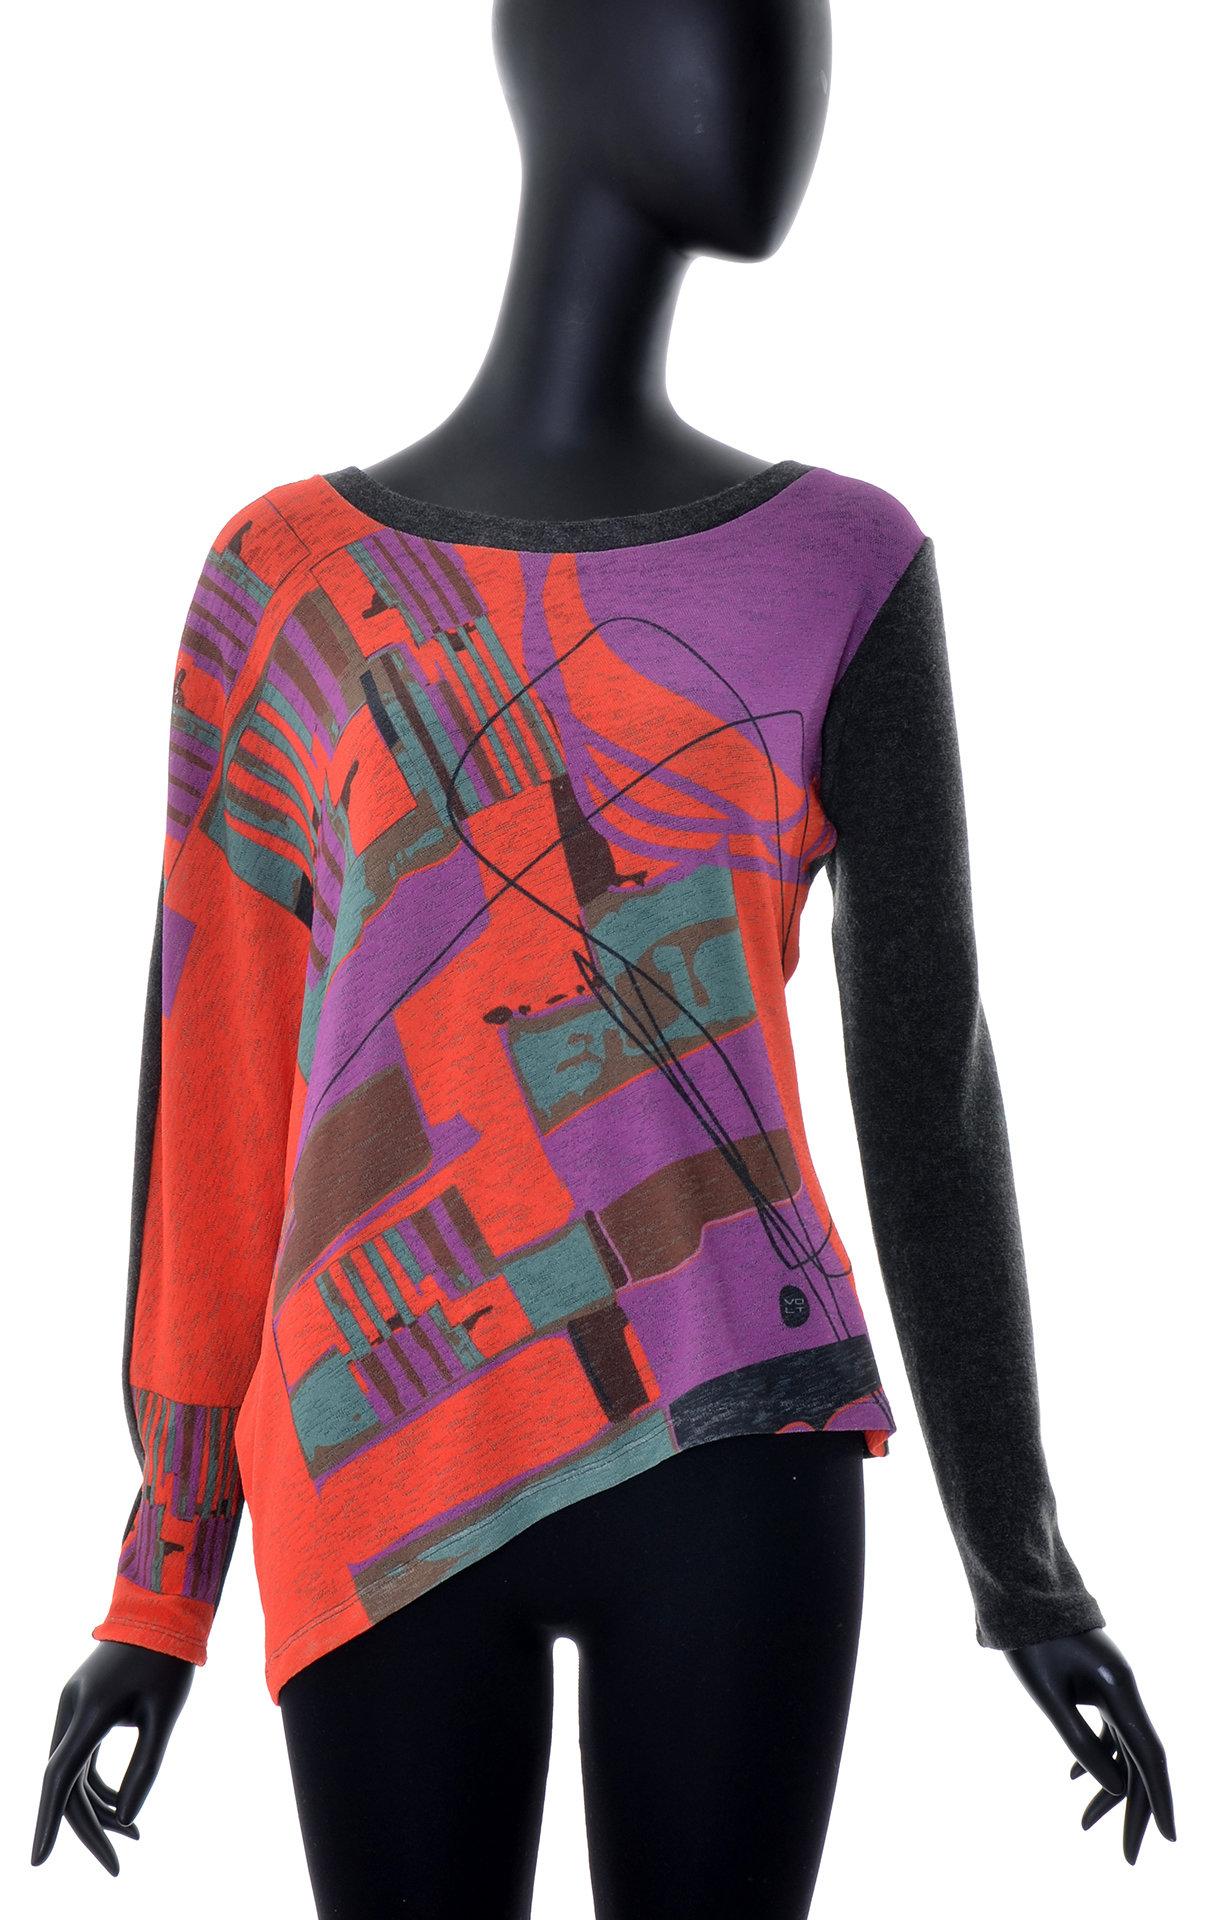 Volt Design: Asymmetrical Purple Pop Abstract Art Tunic (Ships Immed, 1 Left!) VD_360_PLA_C_N1